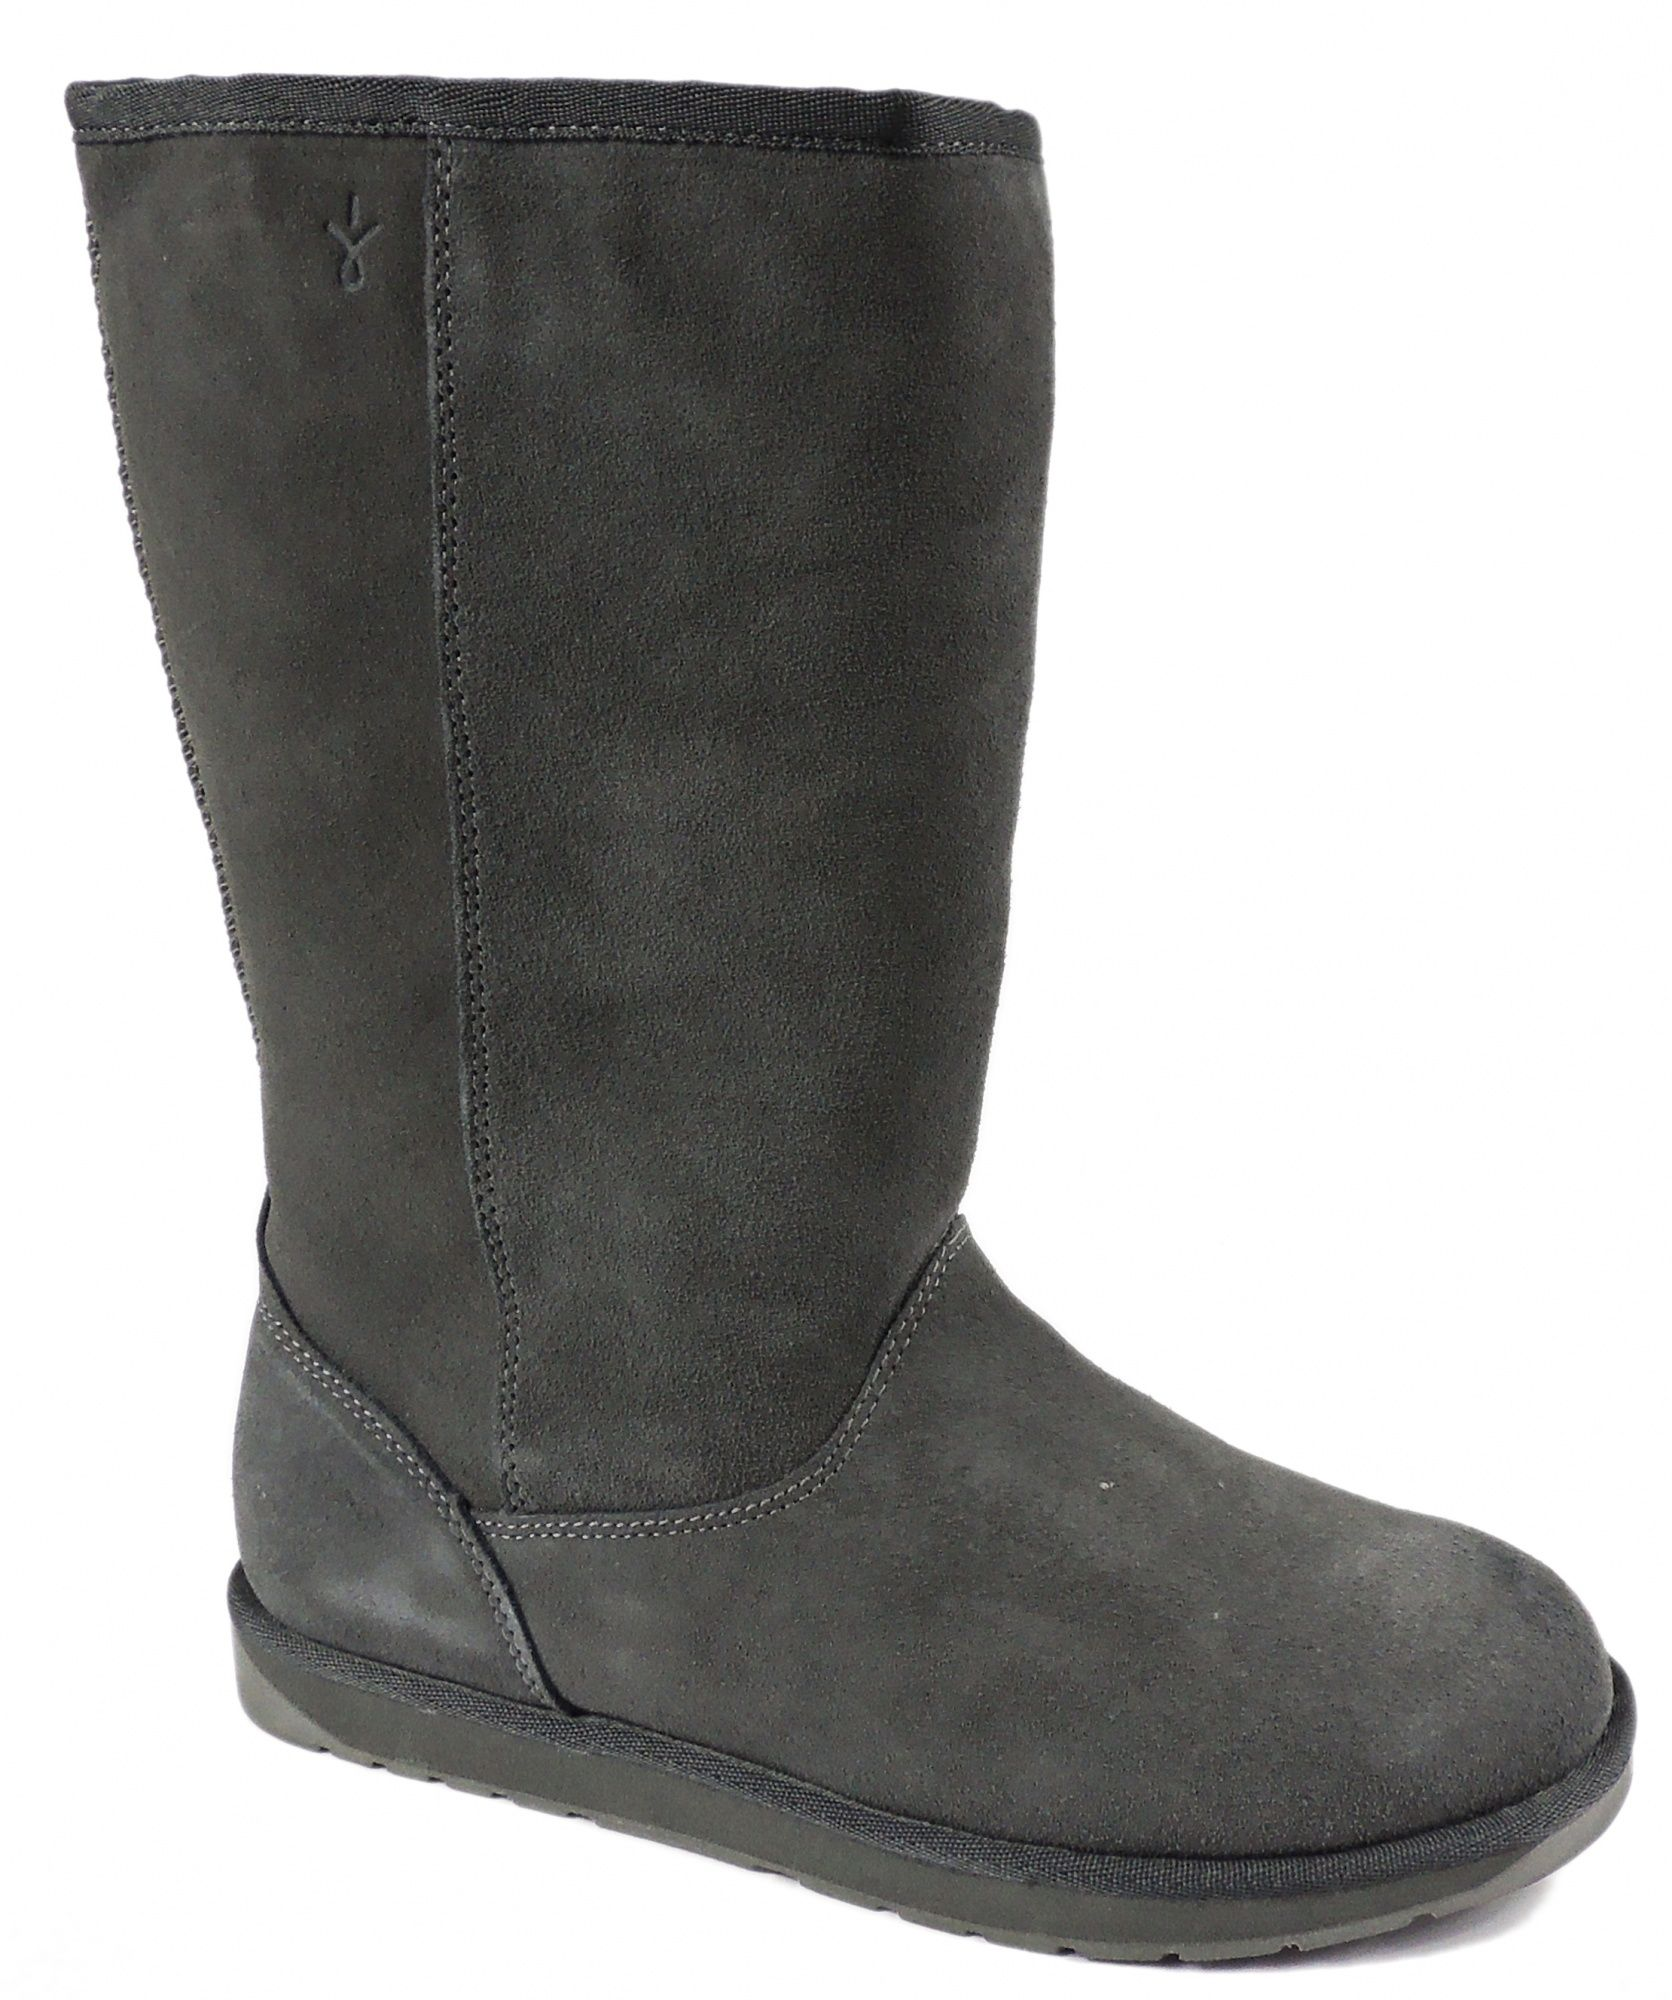 Kozaki Emu 3580109d Kozaki Damskie Intershoe Com Pl Emu Bearpaw Boots Boots